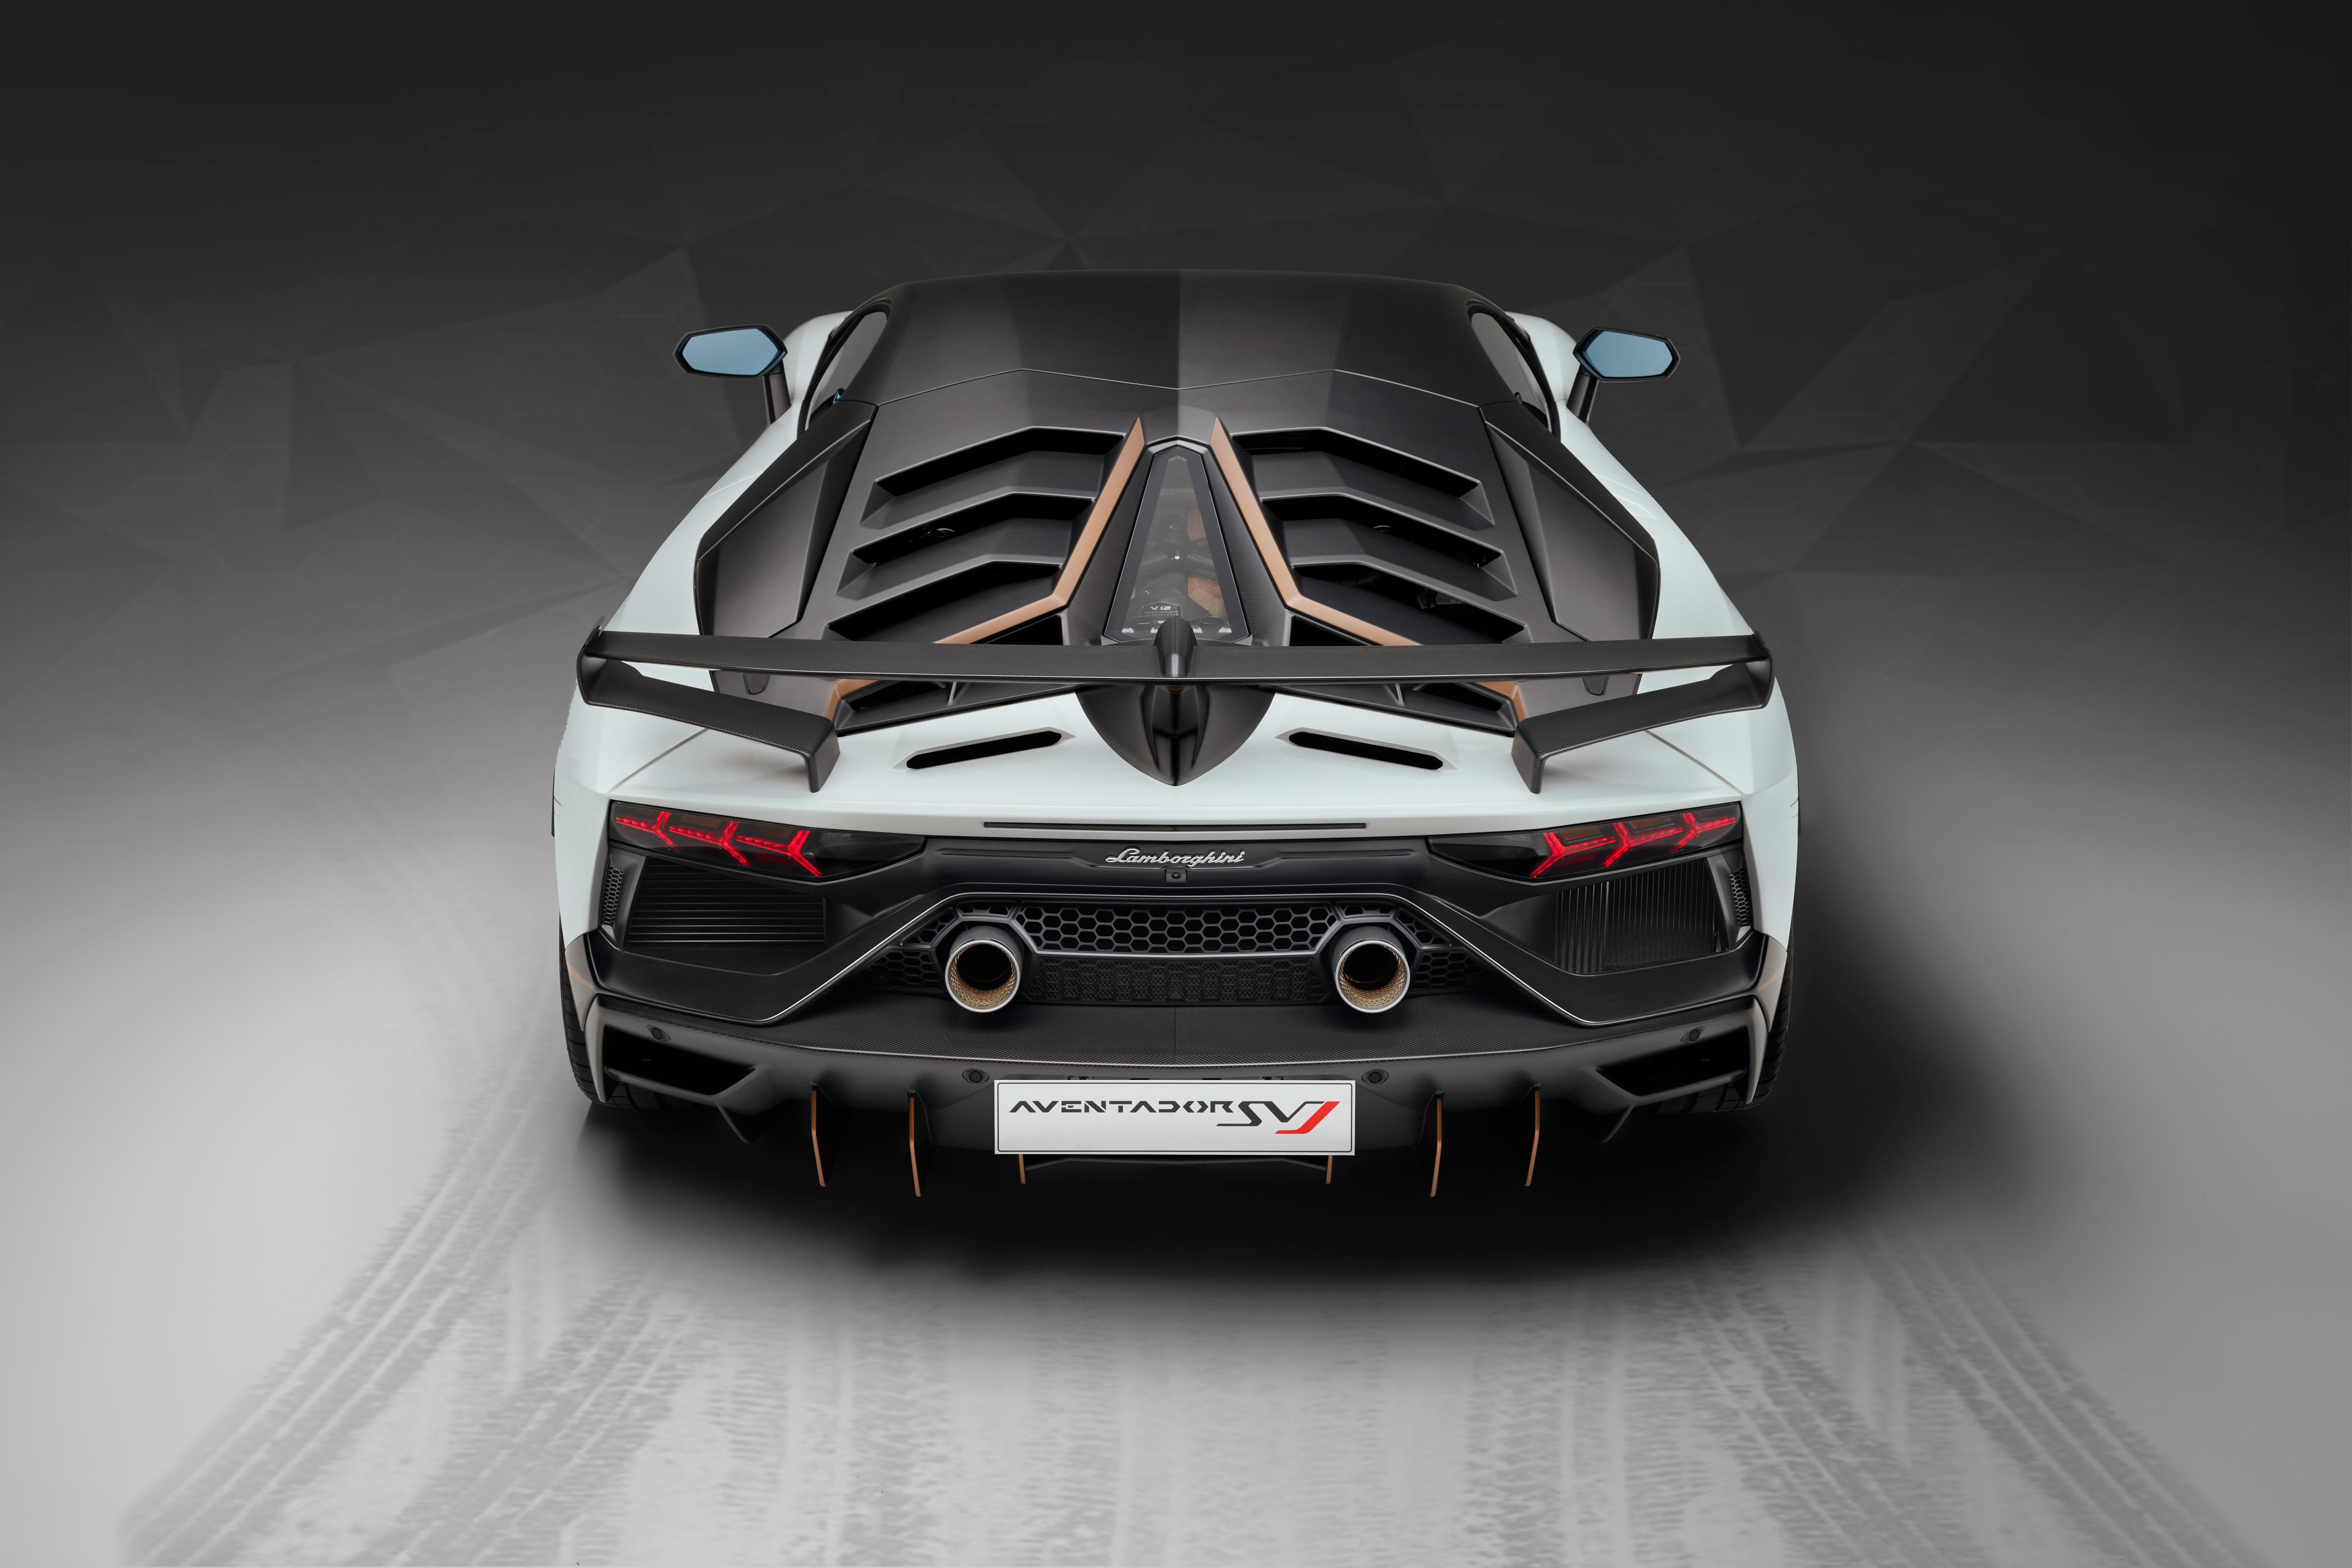 Lamborghini Aventador Svj 63 2018 Rear View Hd Cars 4k